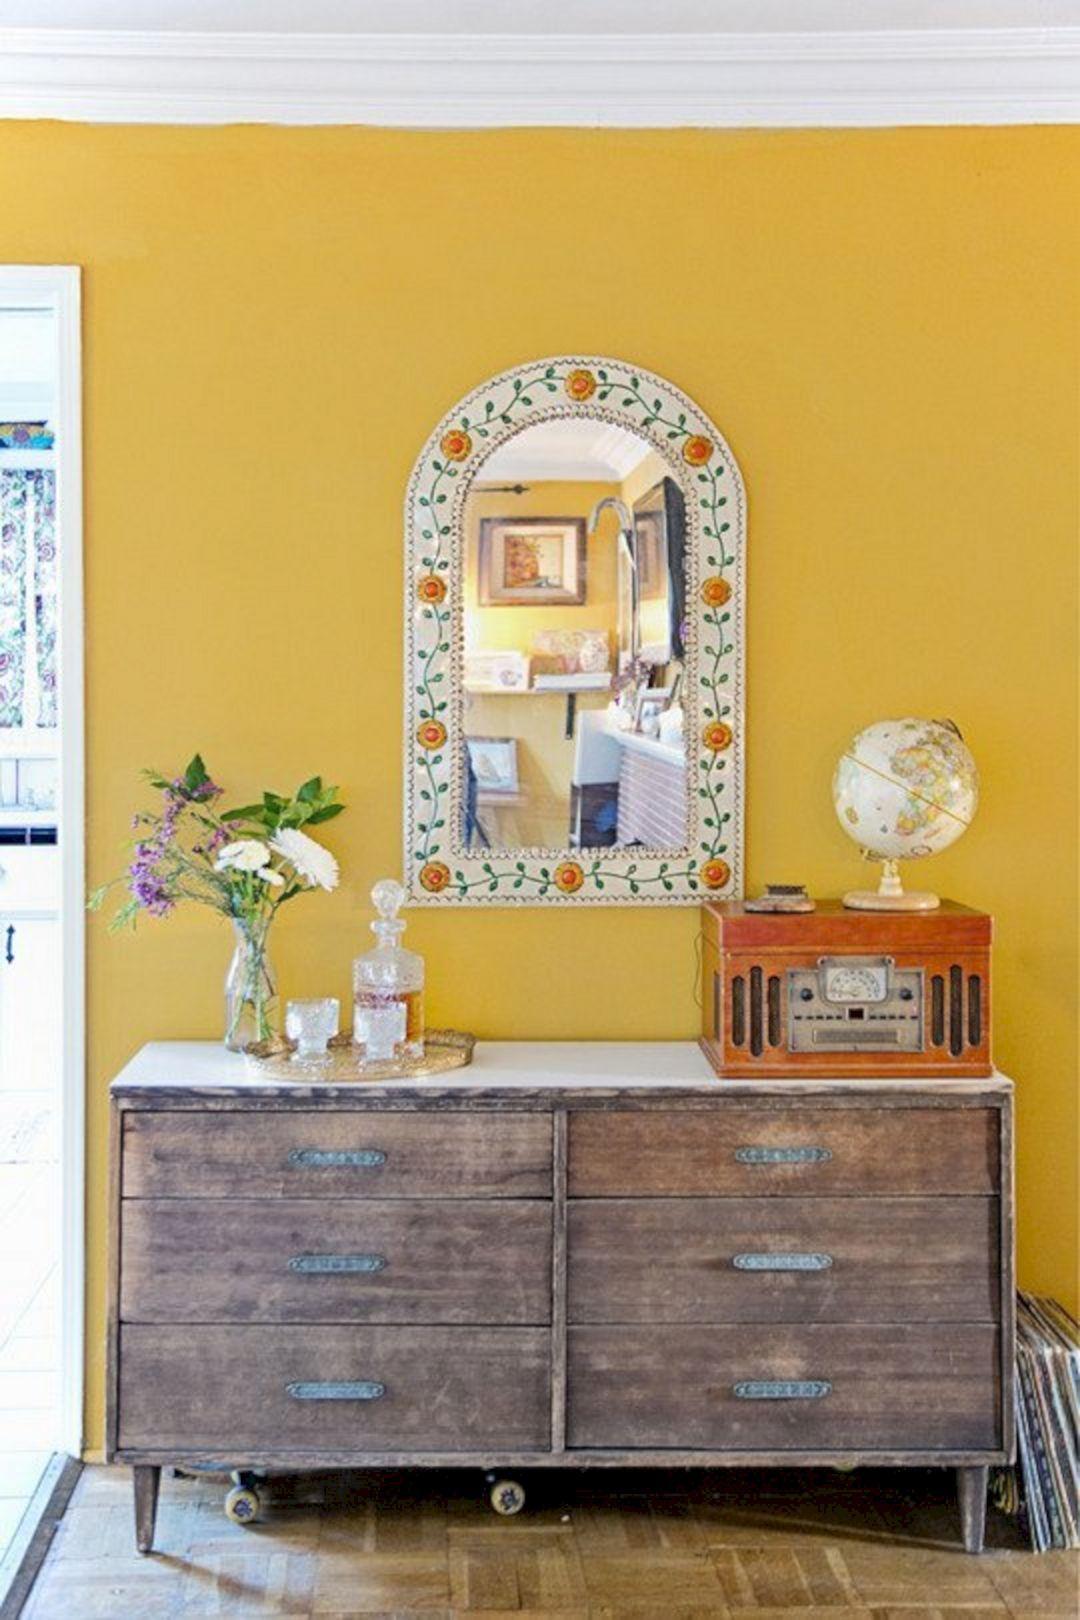 10+ Incredible Yellow Aesthetic Bedroom Decorating Ideas